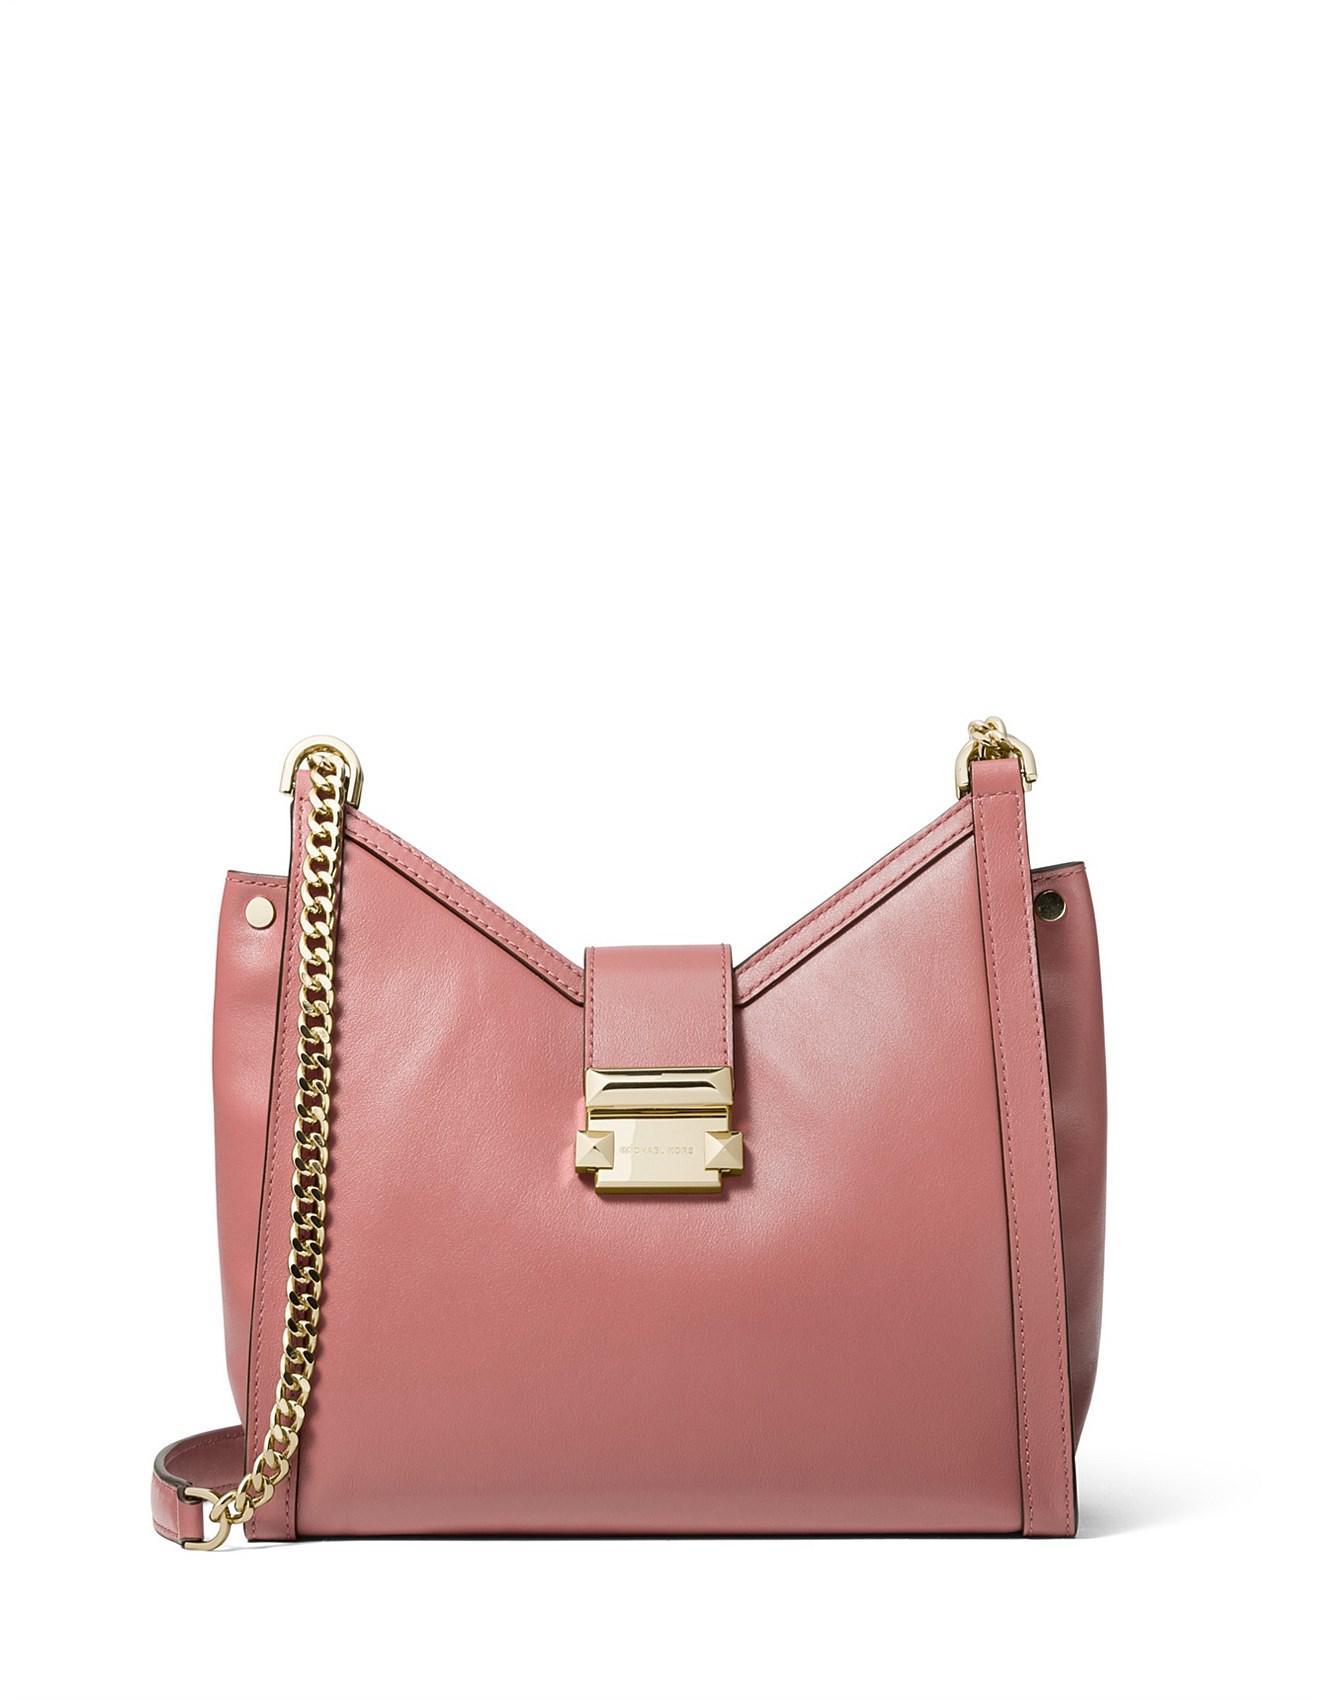 0efca355701e Michael Kors. Women s Whitney Small Leather Chain Shoulder Bag